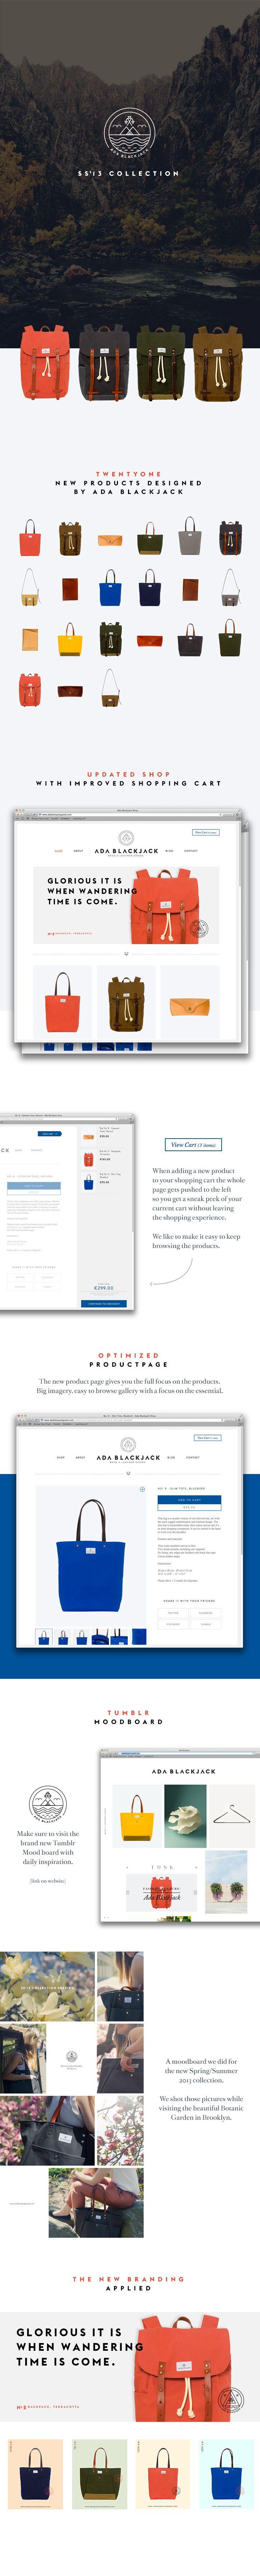 Ada Blackjack SS'13 Art Direction, Branding, Web Design